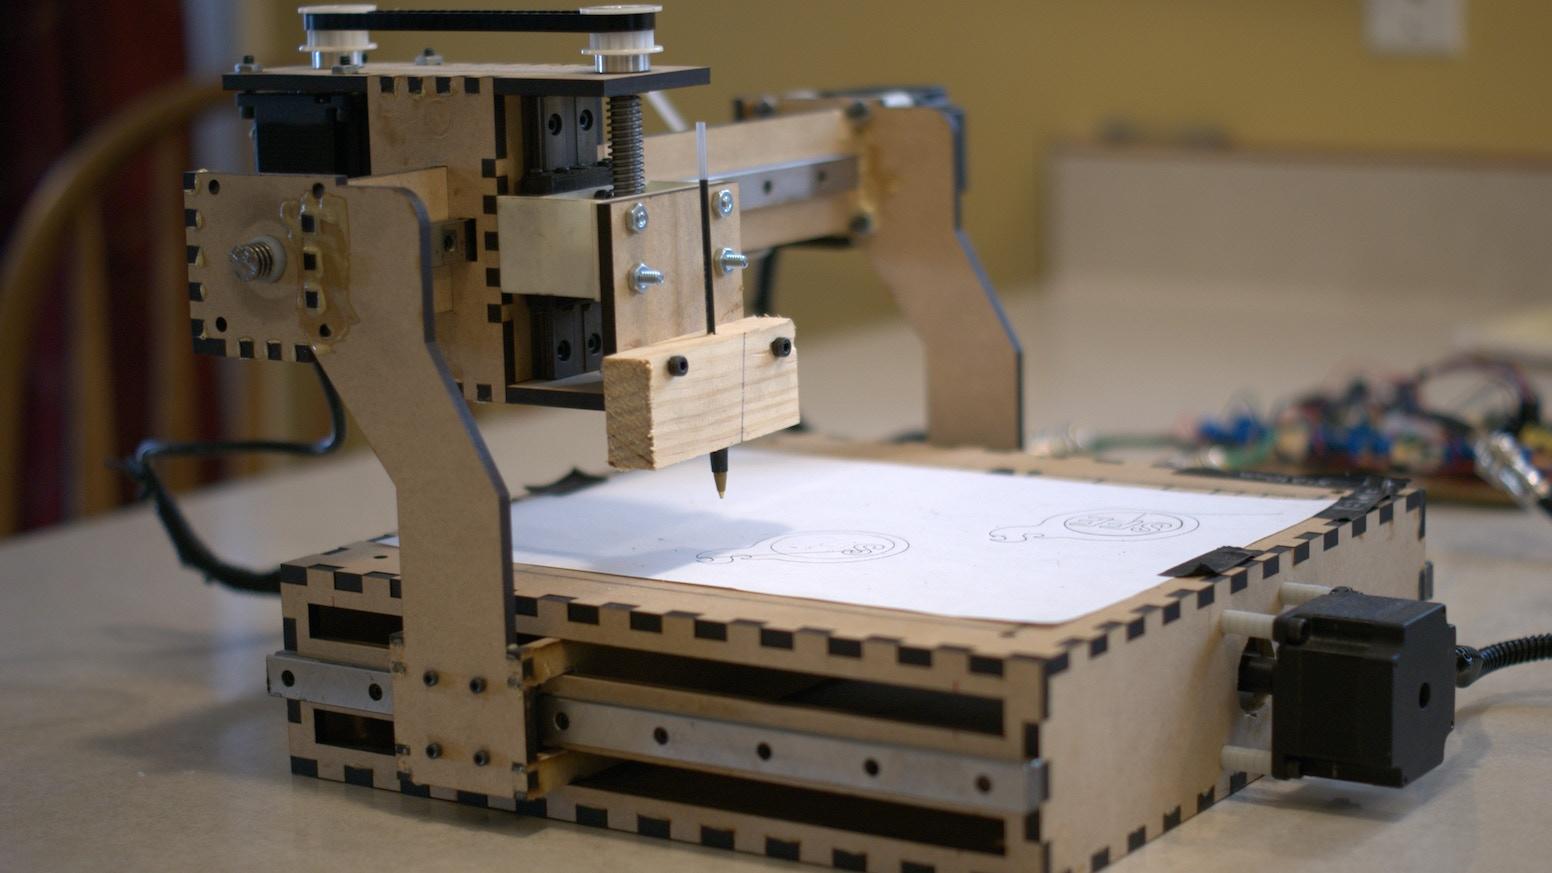 Project ShapeOko: a $300 complete cnc machine  by Edward